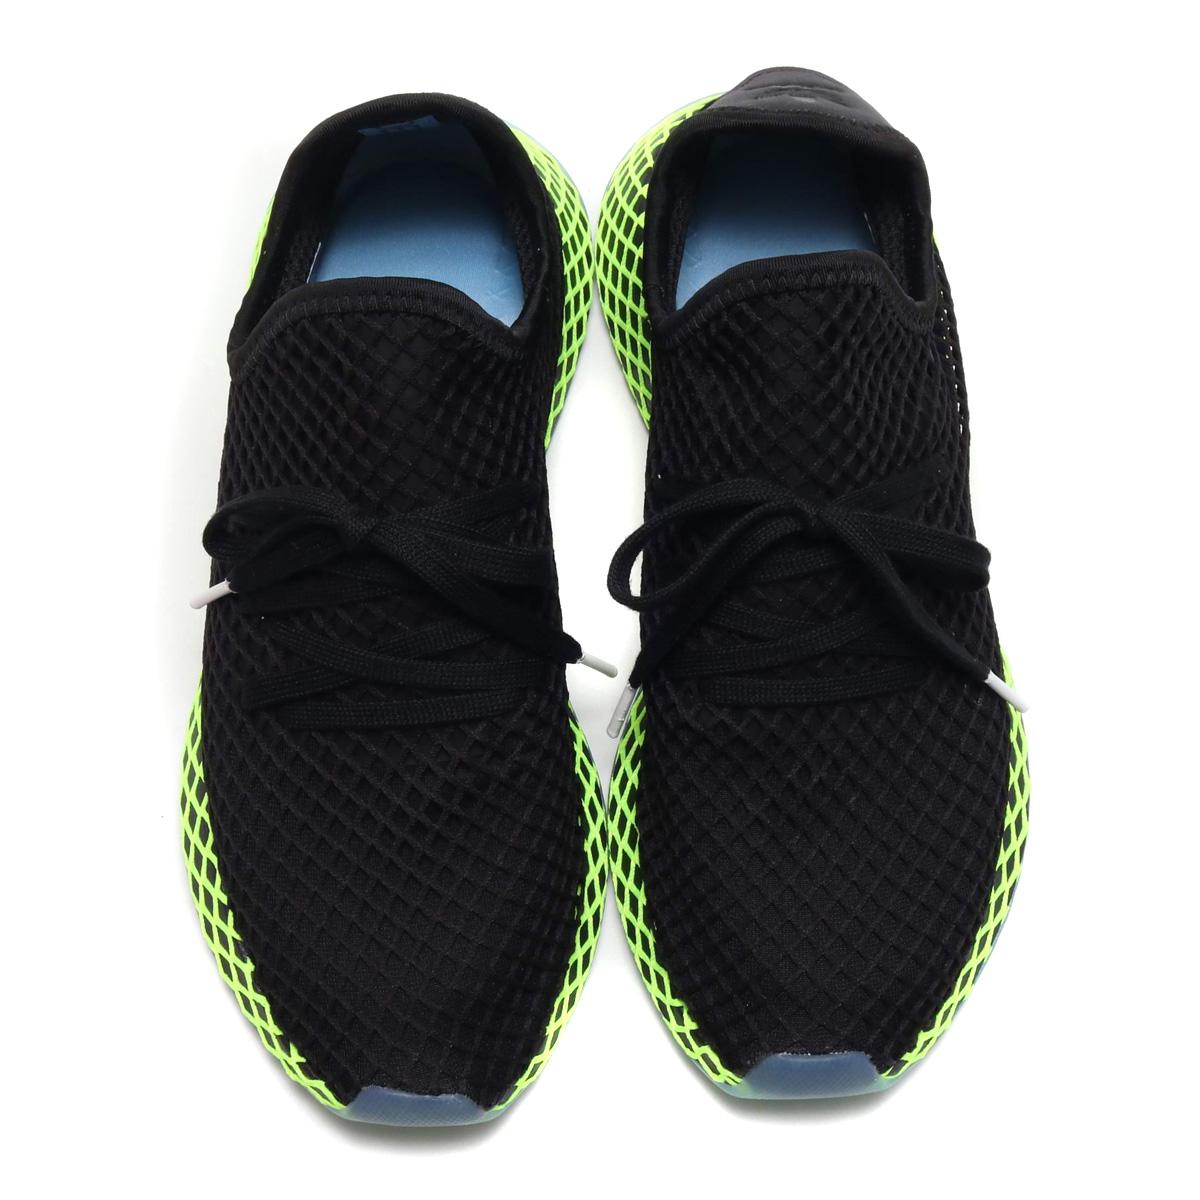 promo code 60d54 bd43f adidas Originals DEERUPT RUNNER (アディダスオリジナルスディラプトランナー) CORE BLACKCORE  BLACKASH BLUE 18FA-I